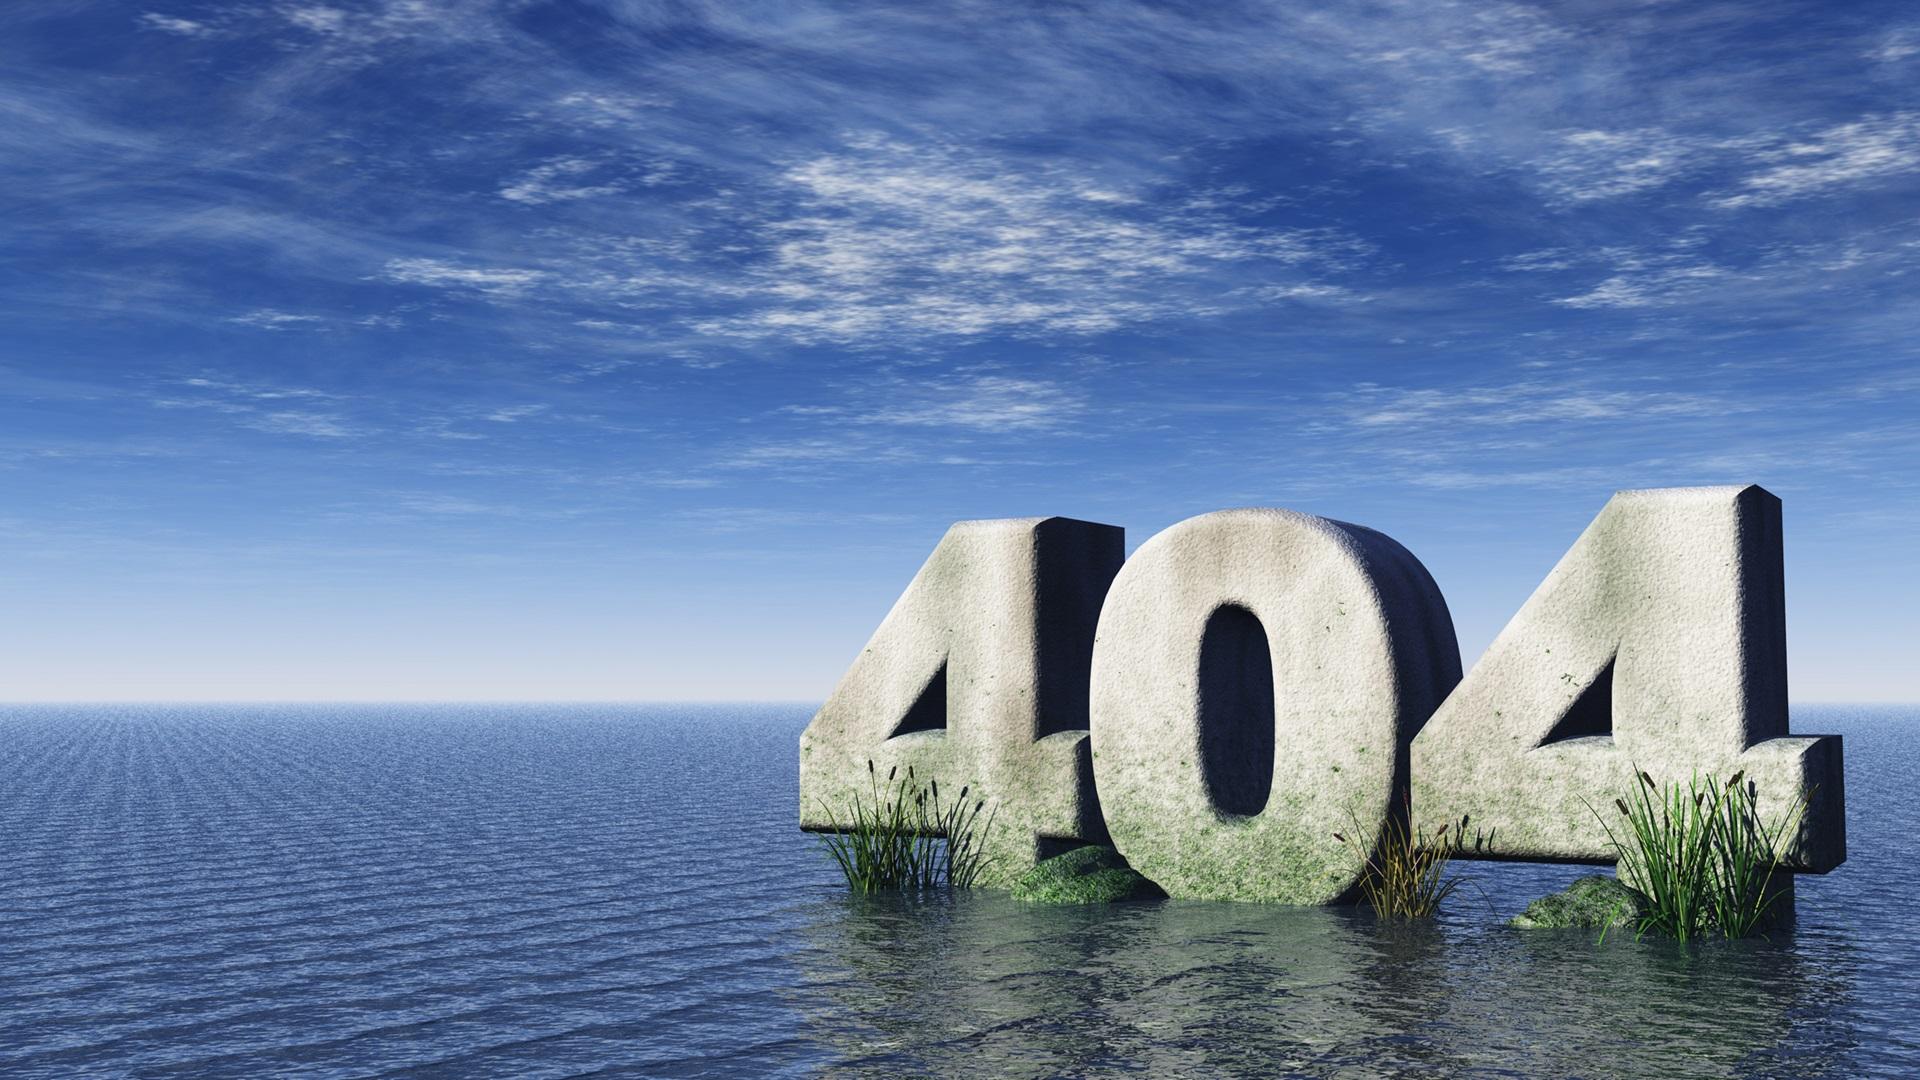 404 - foutpagina water